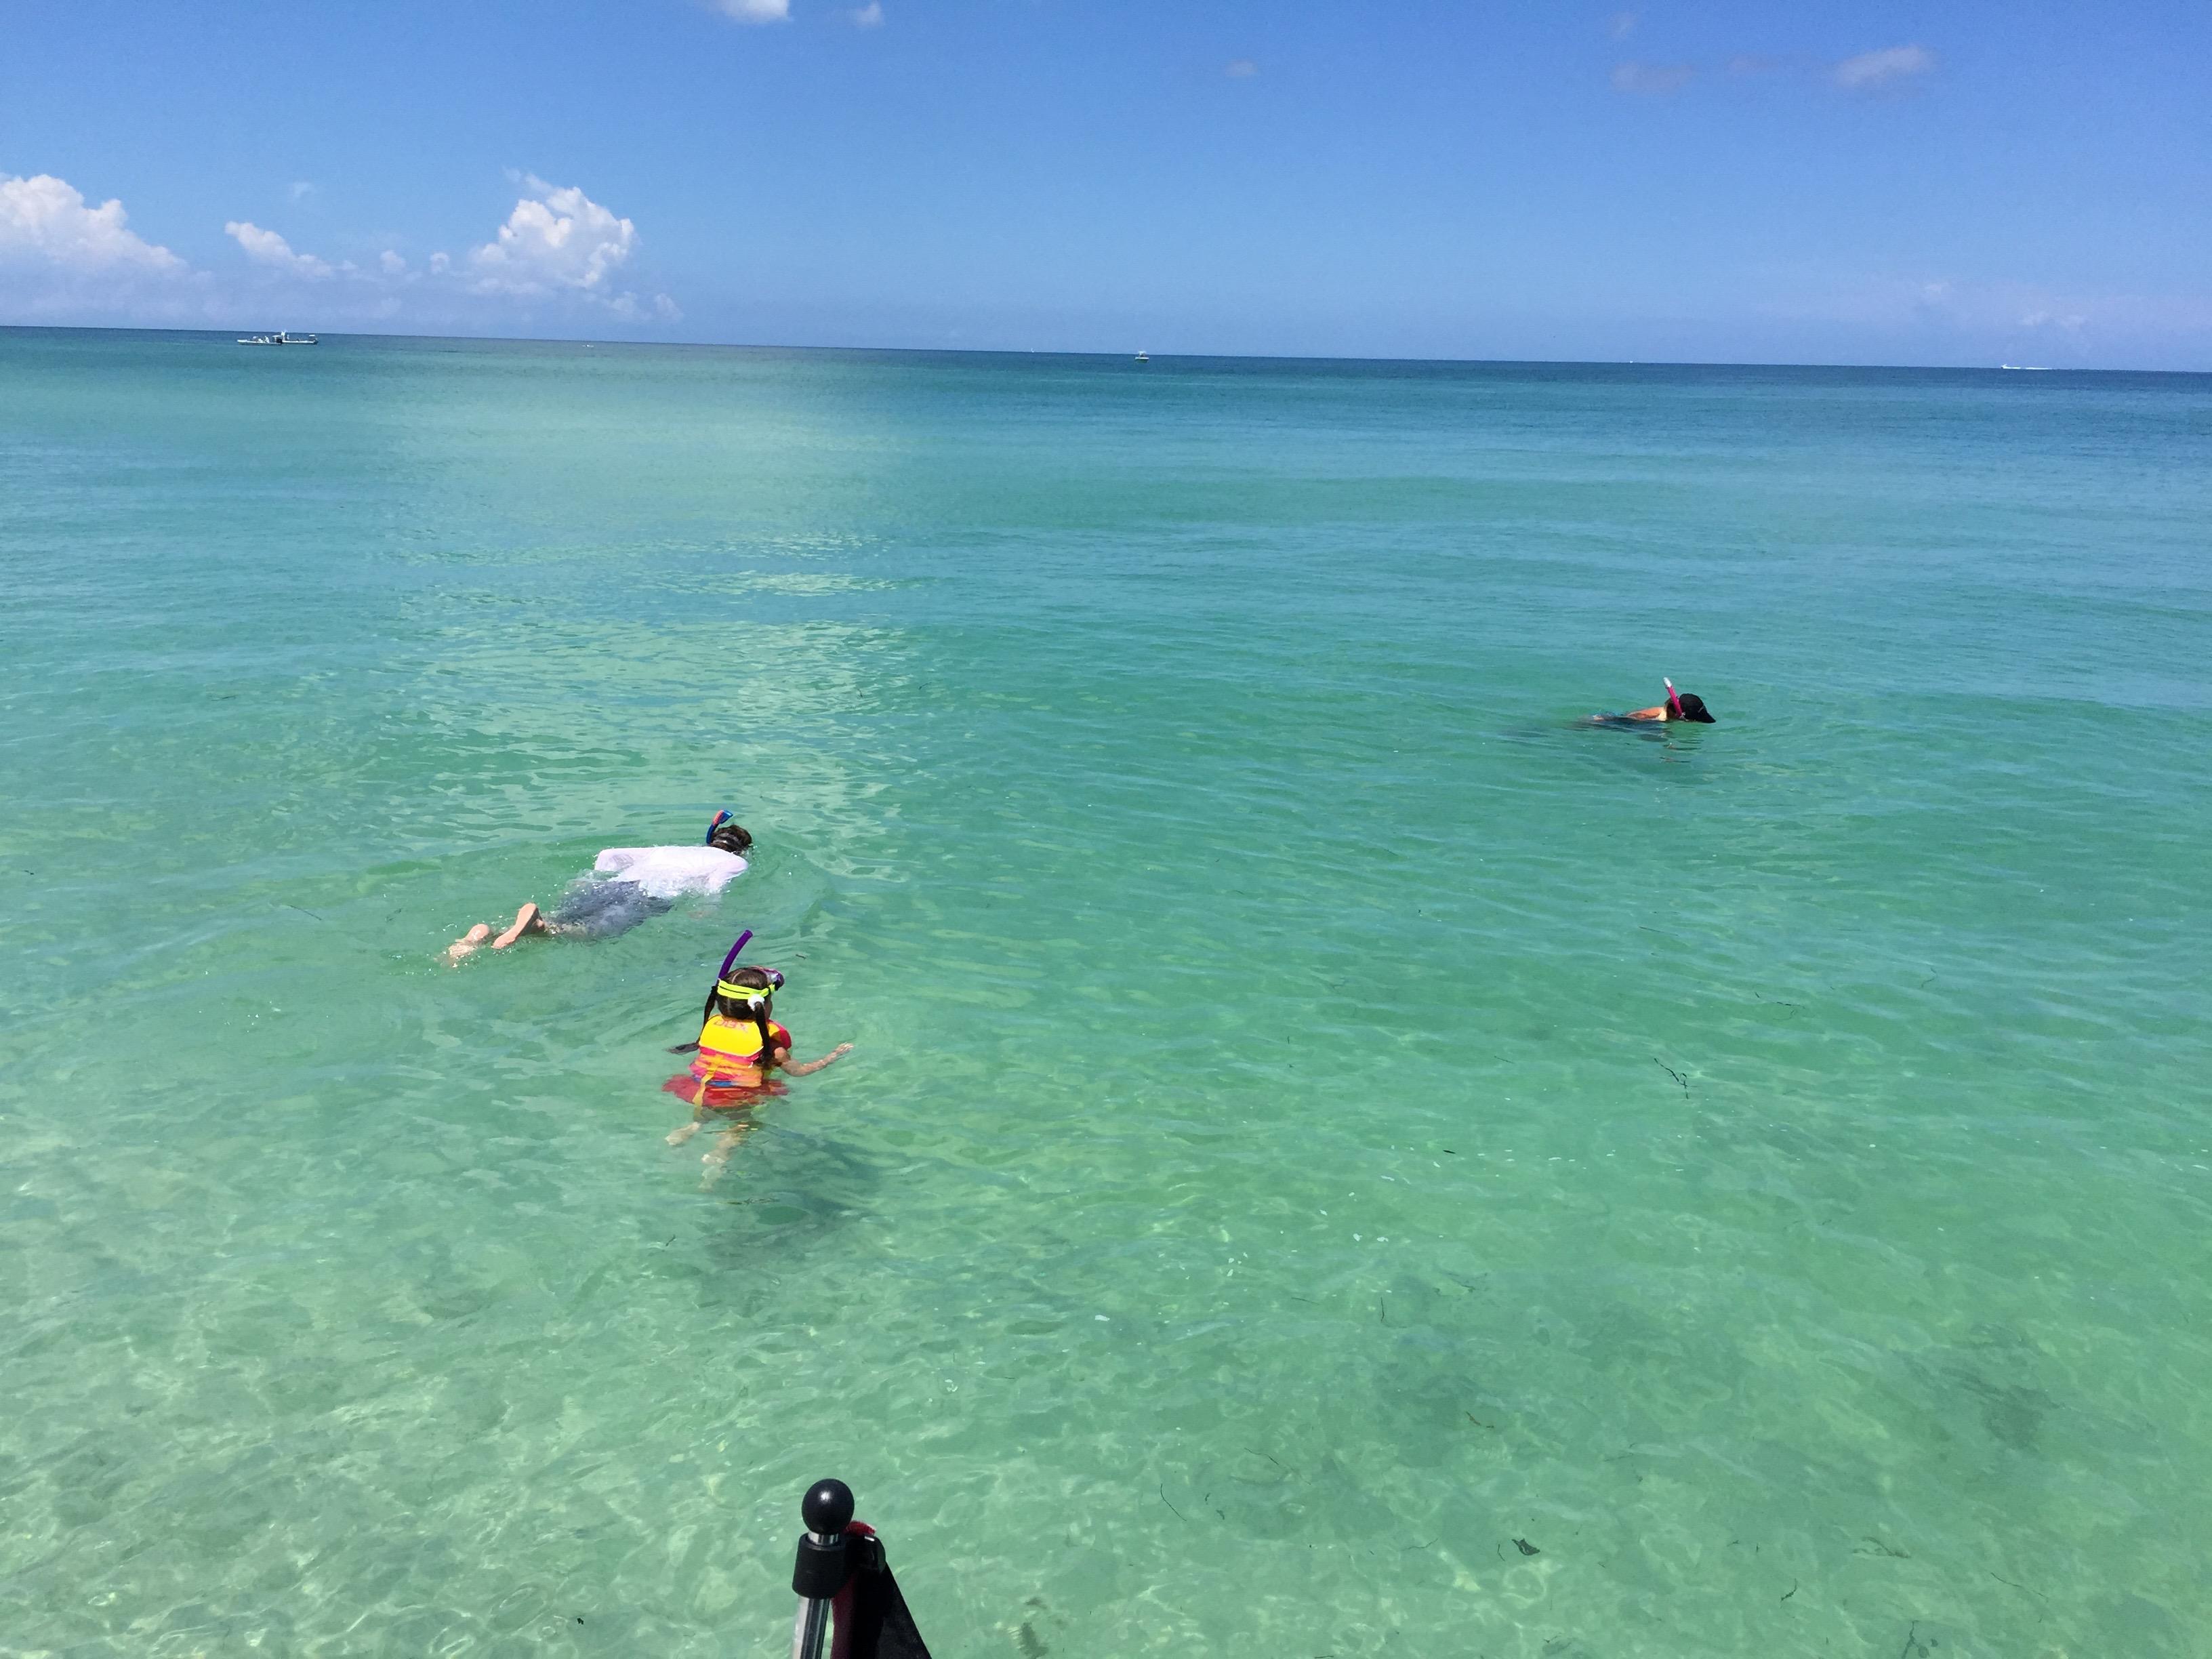 Snorkling at Boca Grande